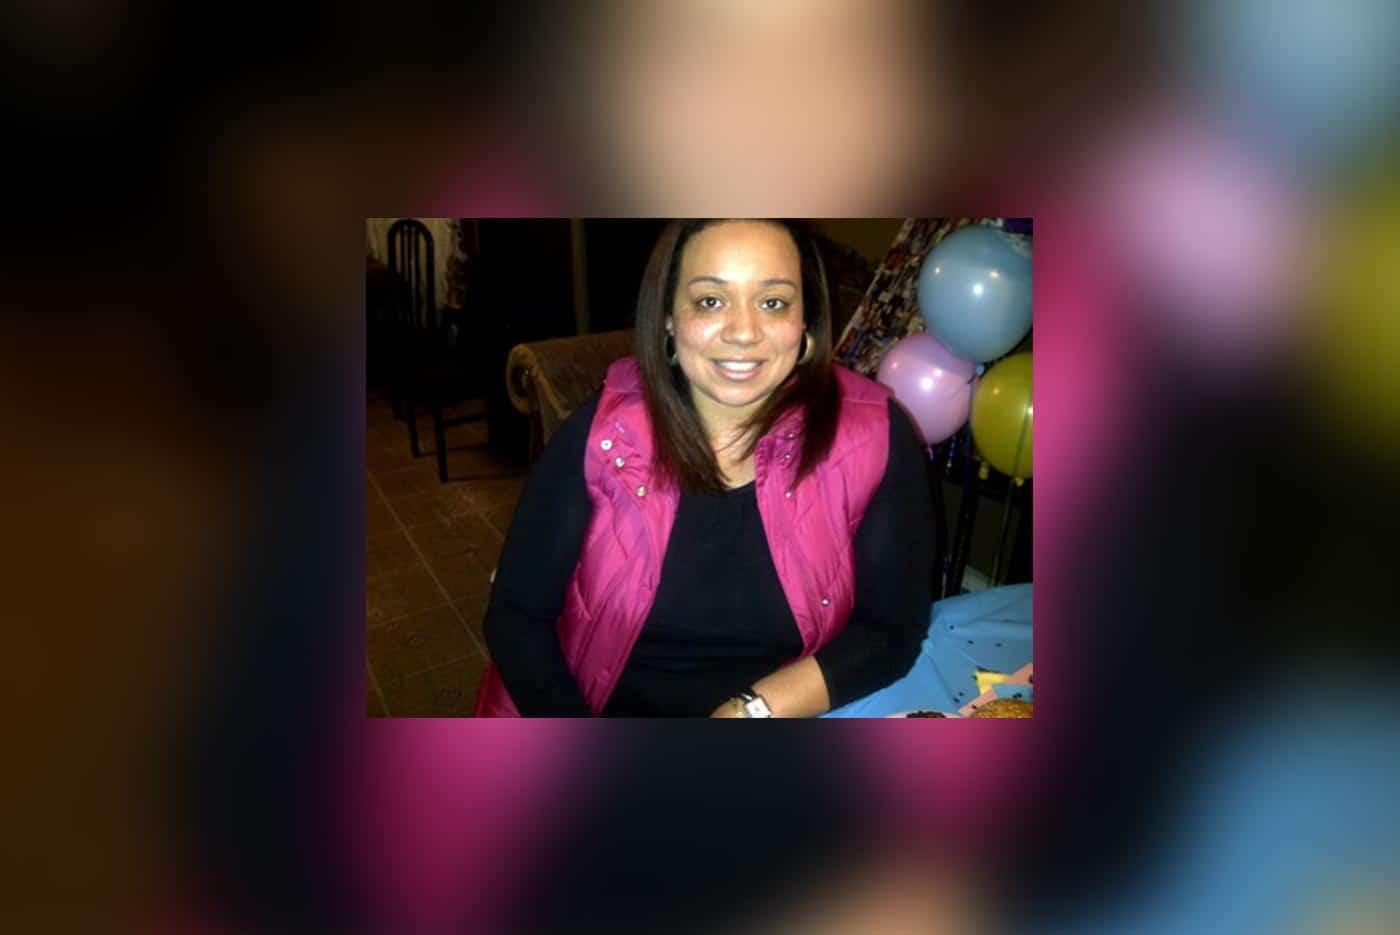 Scholarship winner Sirena Cordova